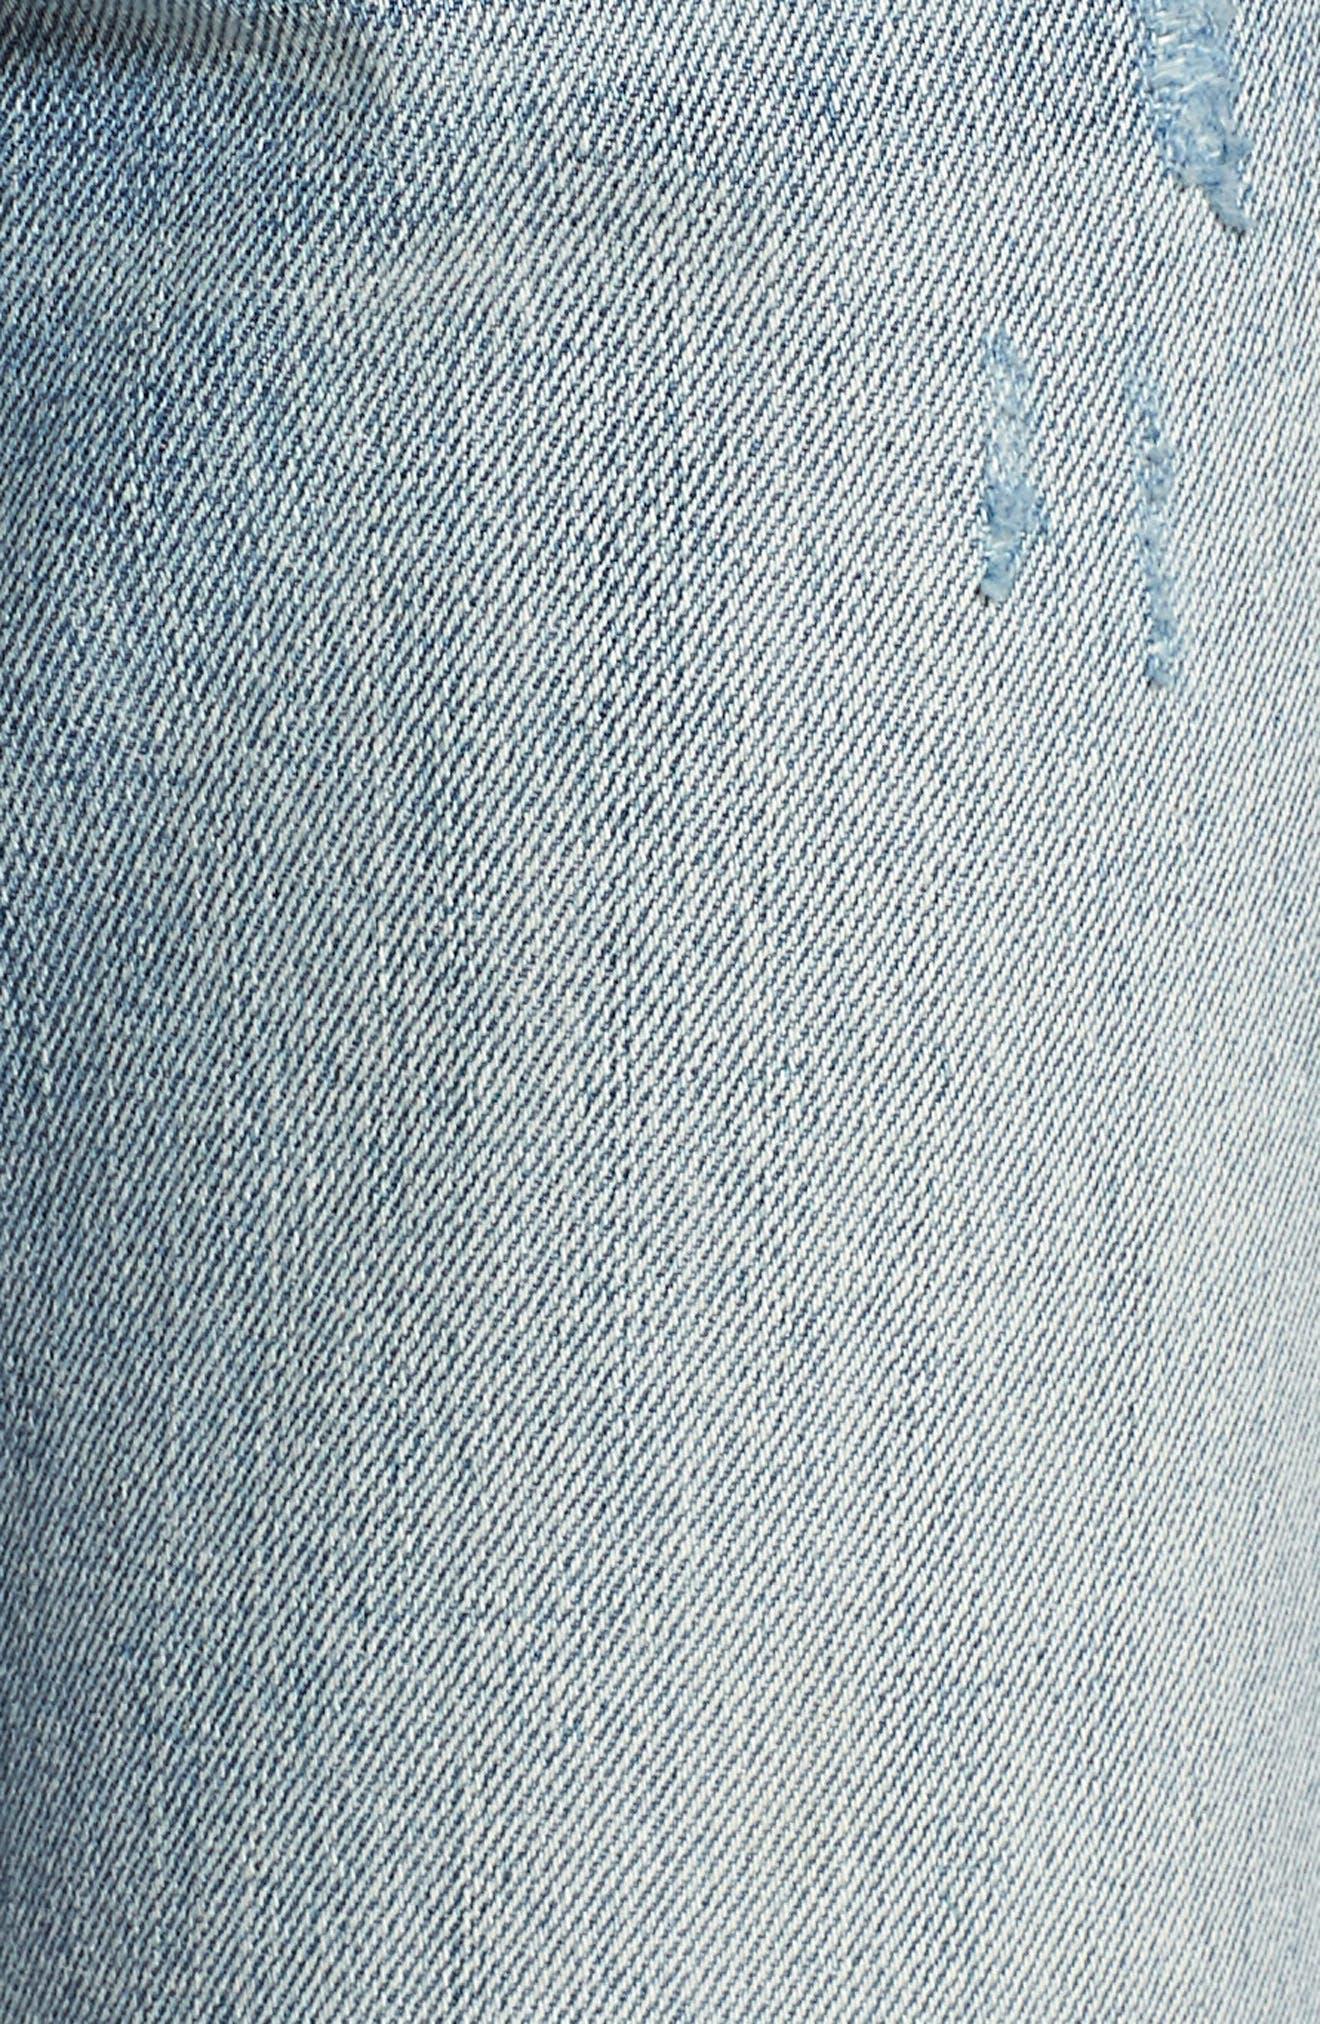 Now or Never Side Stripe Skinny Jeans,                             Alternate thumbnail 6, color,                             400